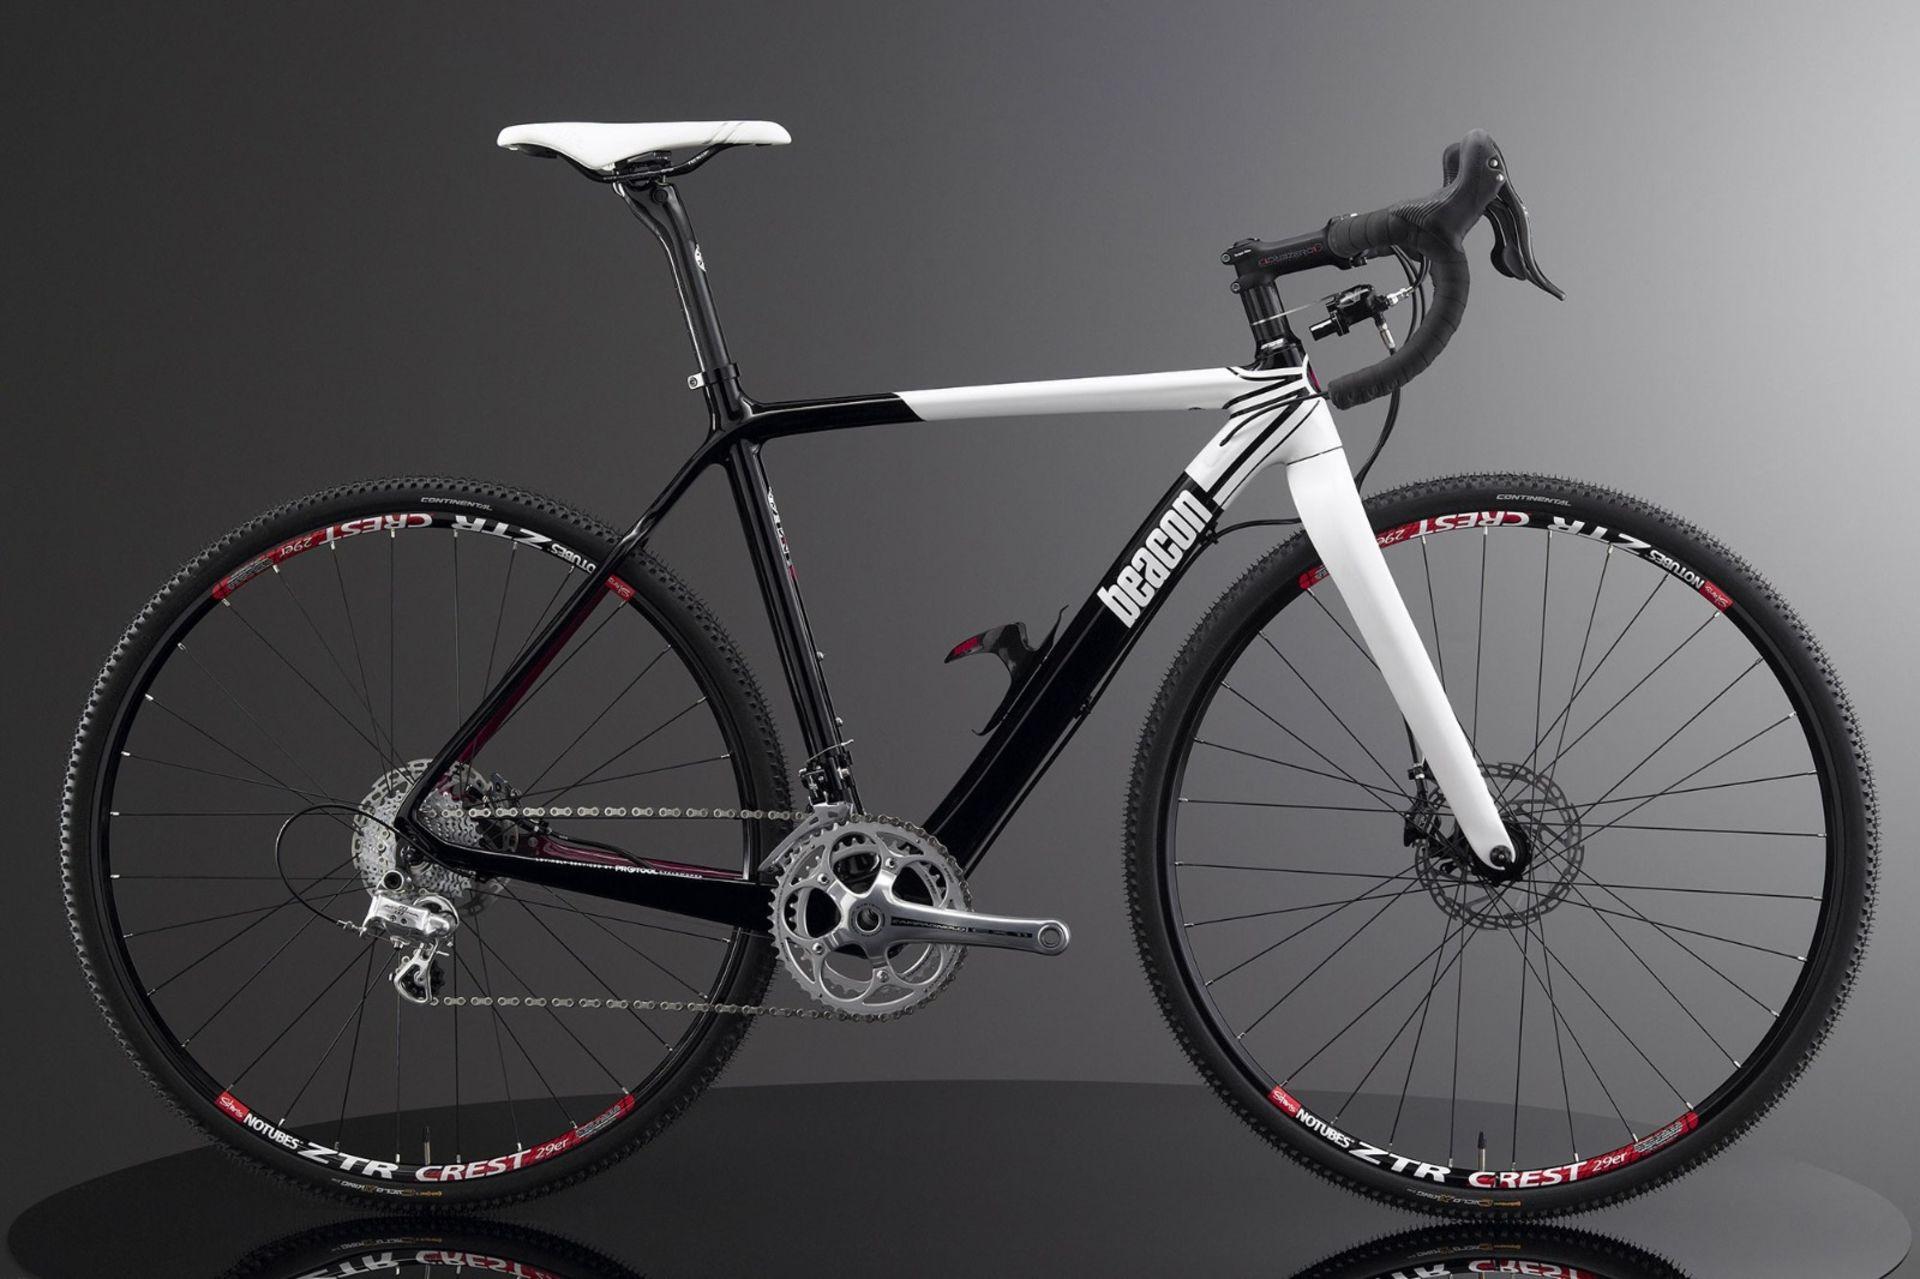 Lot 17 - 1 x Beacon Model BF-45, Size 540, Carbon Fibre Bike Frame in Black & White.